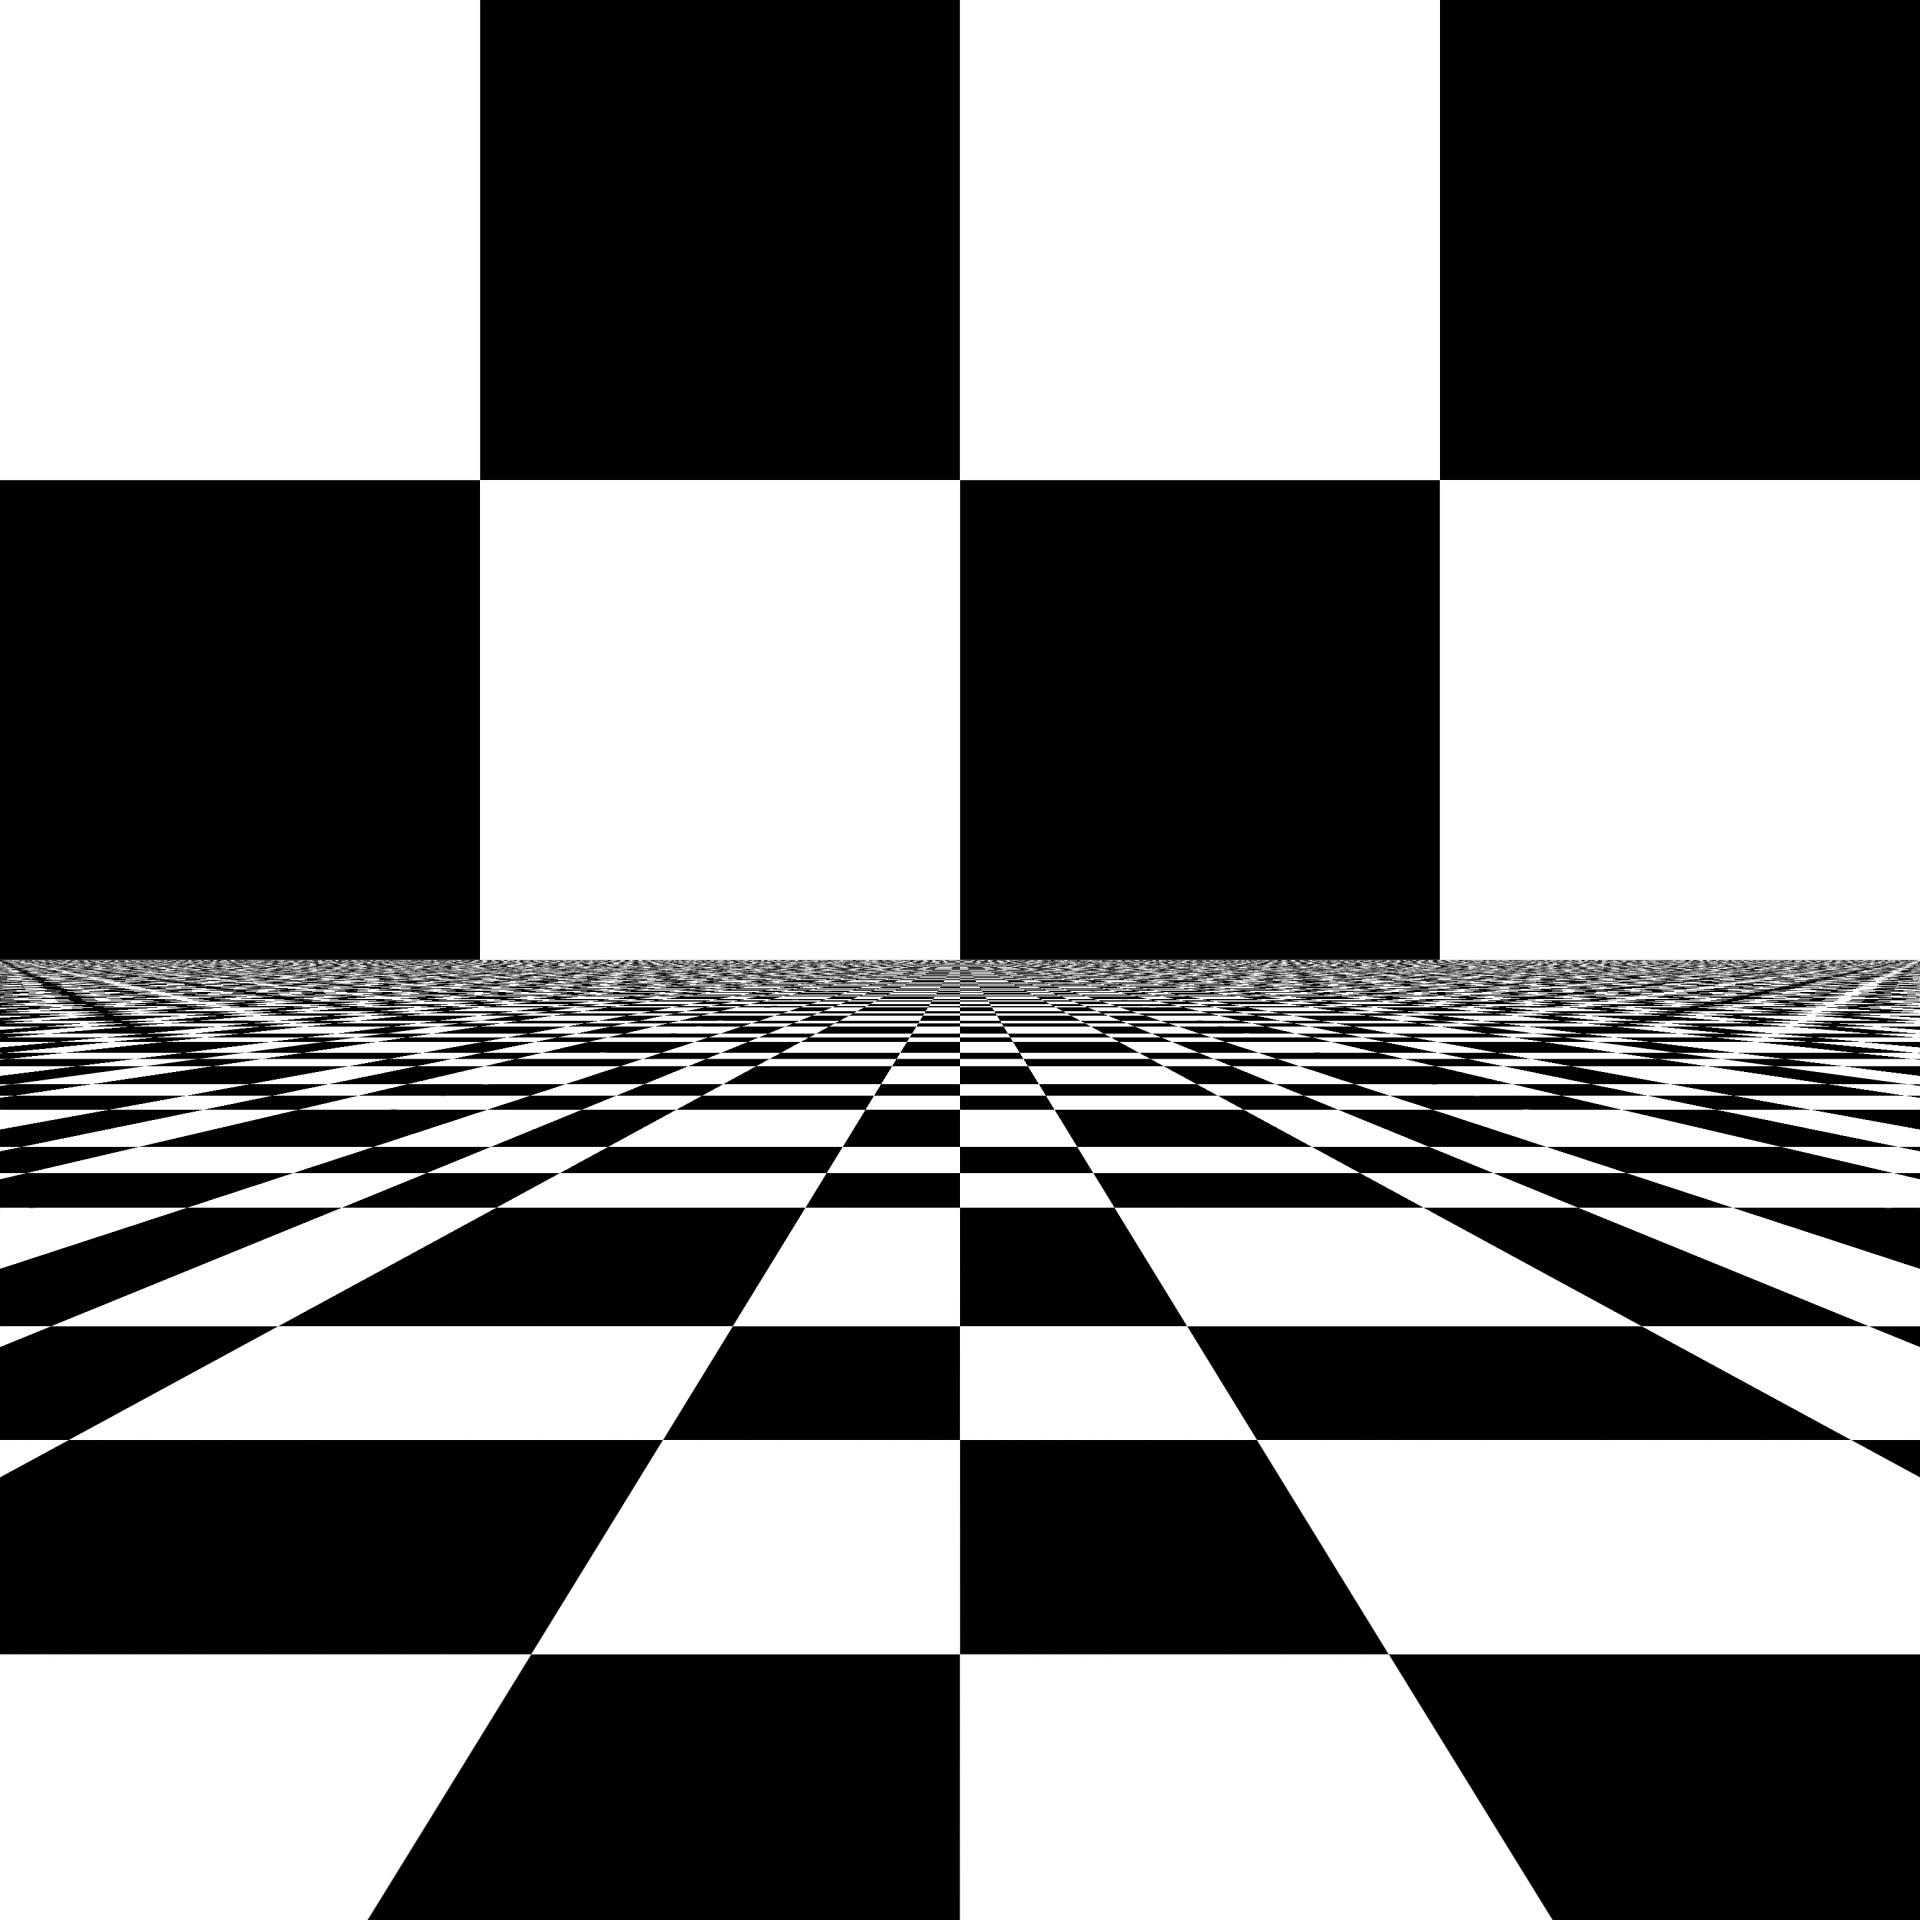 3d Floor Wallpaper Online Perspective Checkerboard Free Stock Photo Public Domain